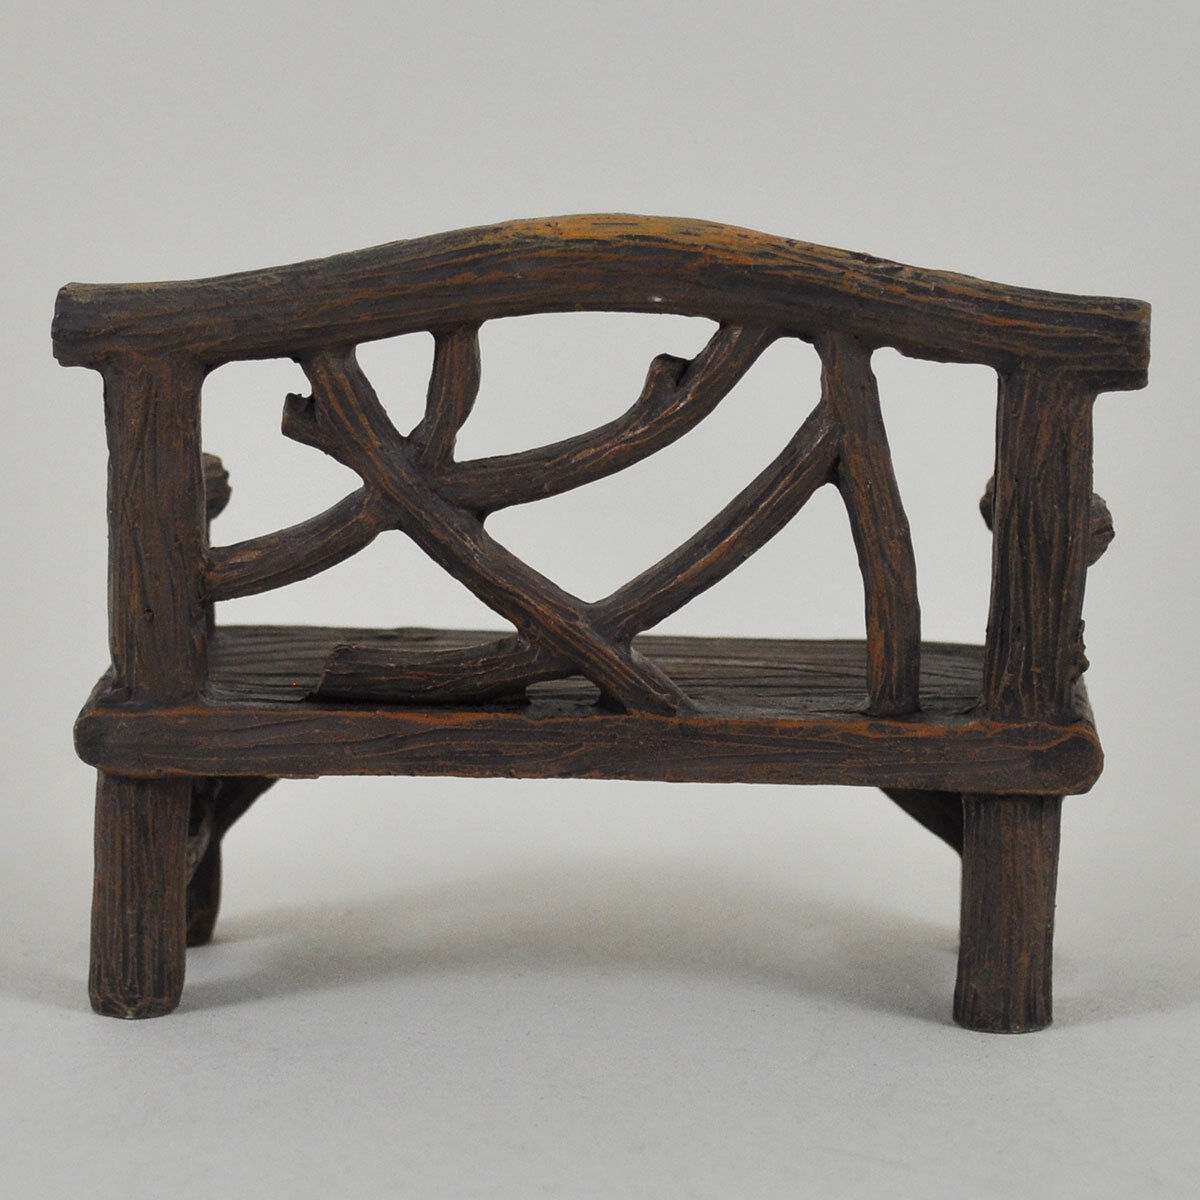 Mini Fairy Garden Bench Chair Miniature Decor Pixie Elf Magic Accessory 39602